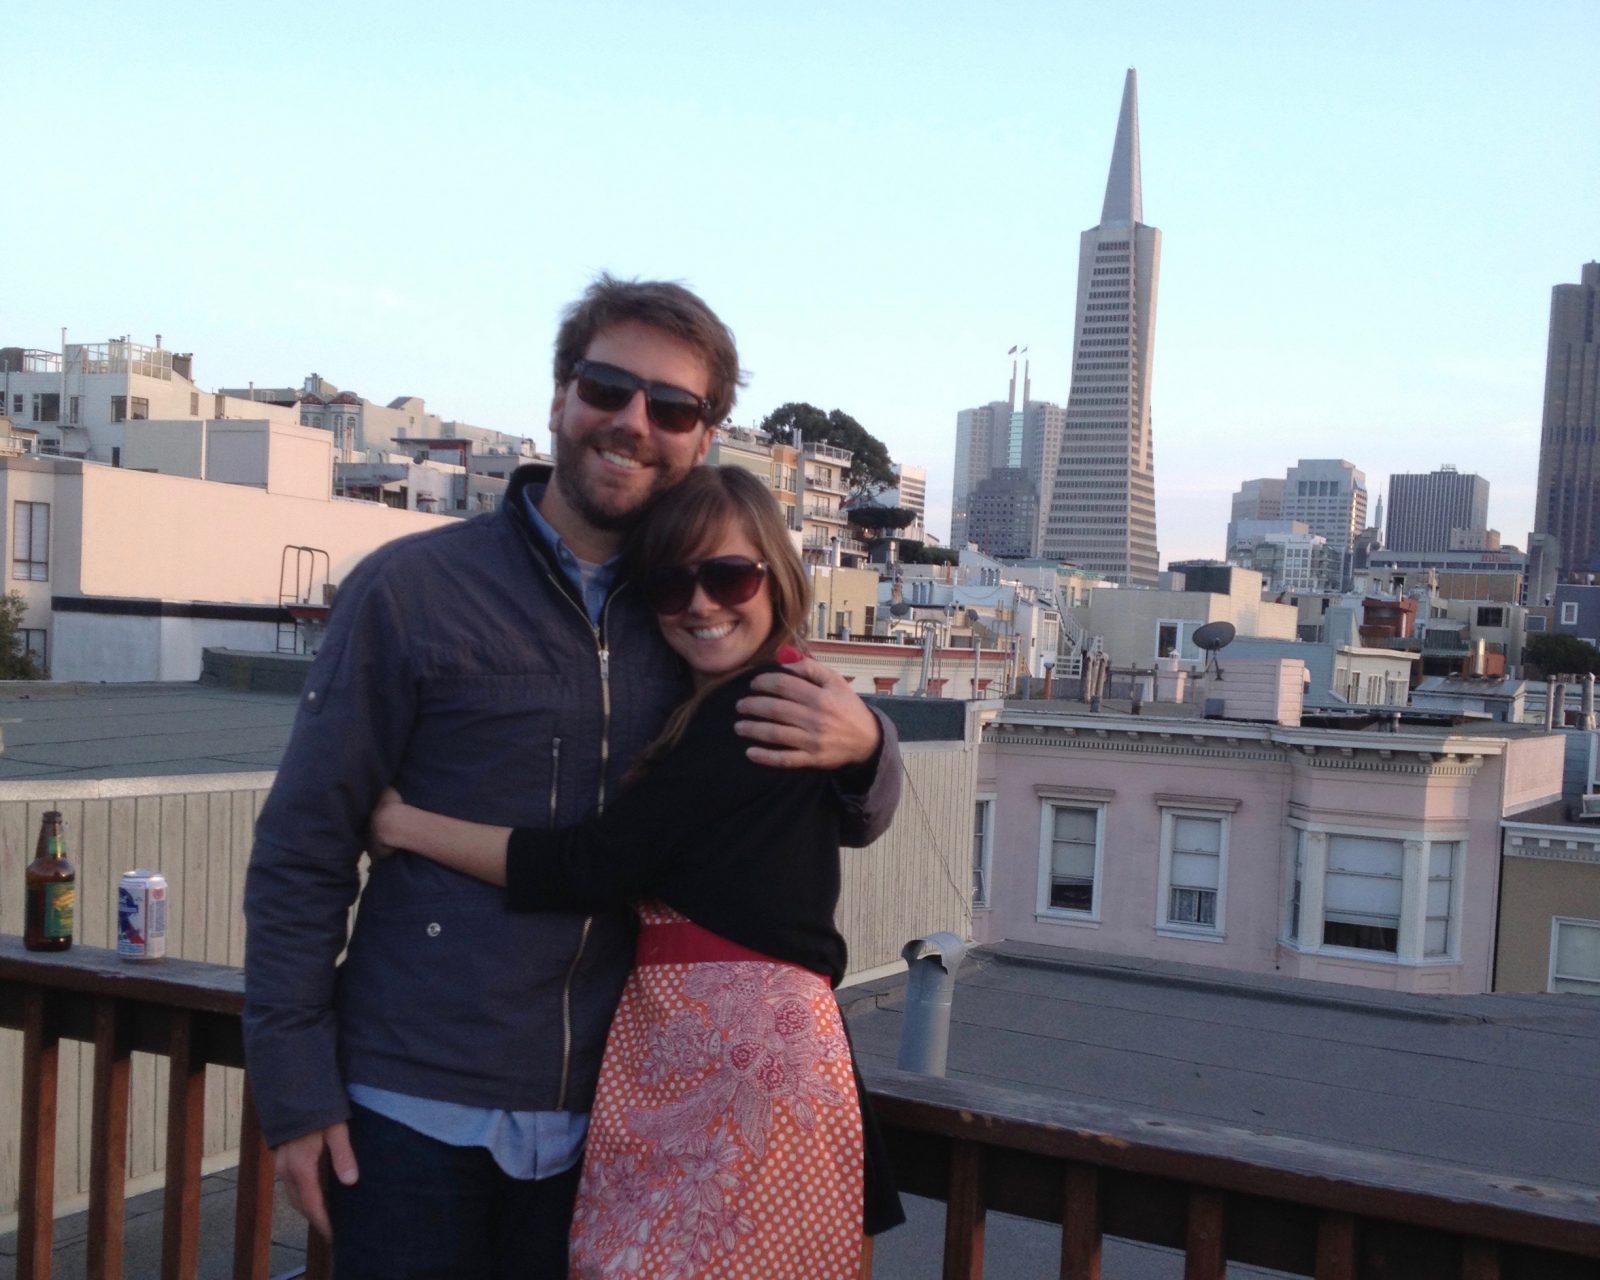 Learn to Code Online: Kim & Ryan